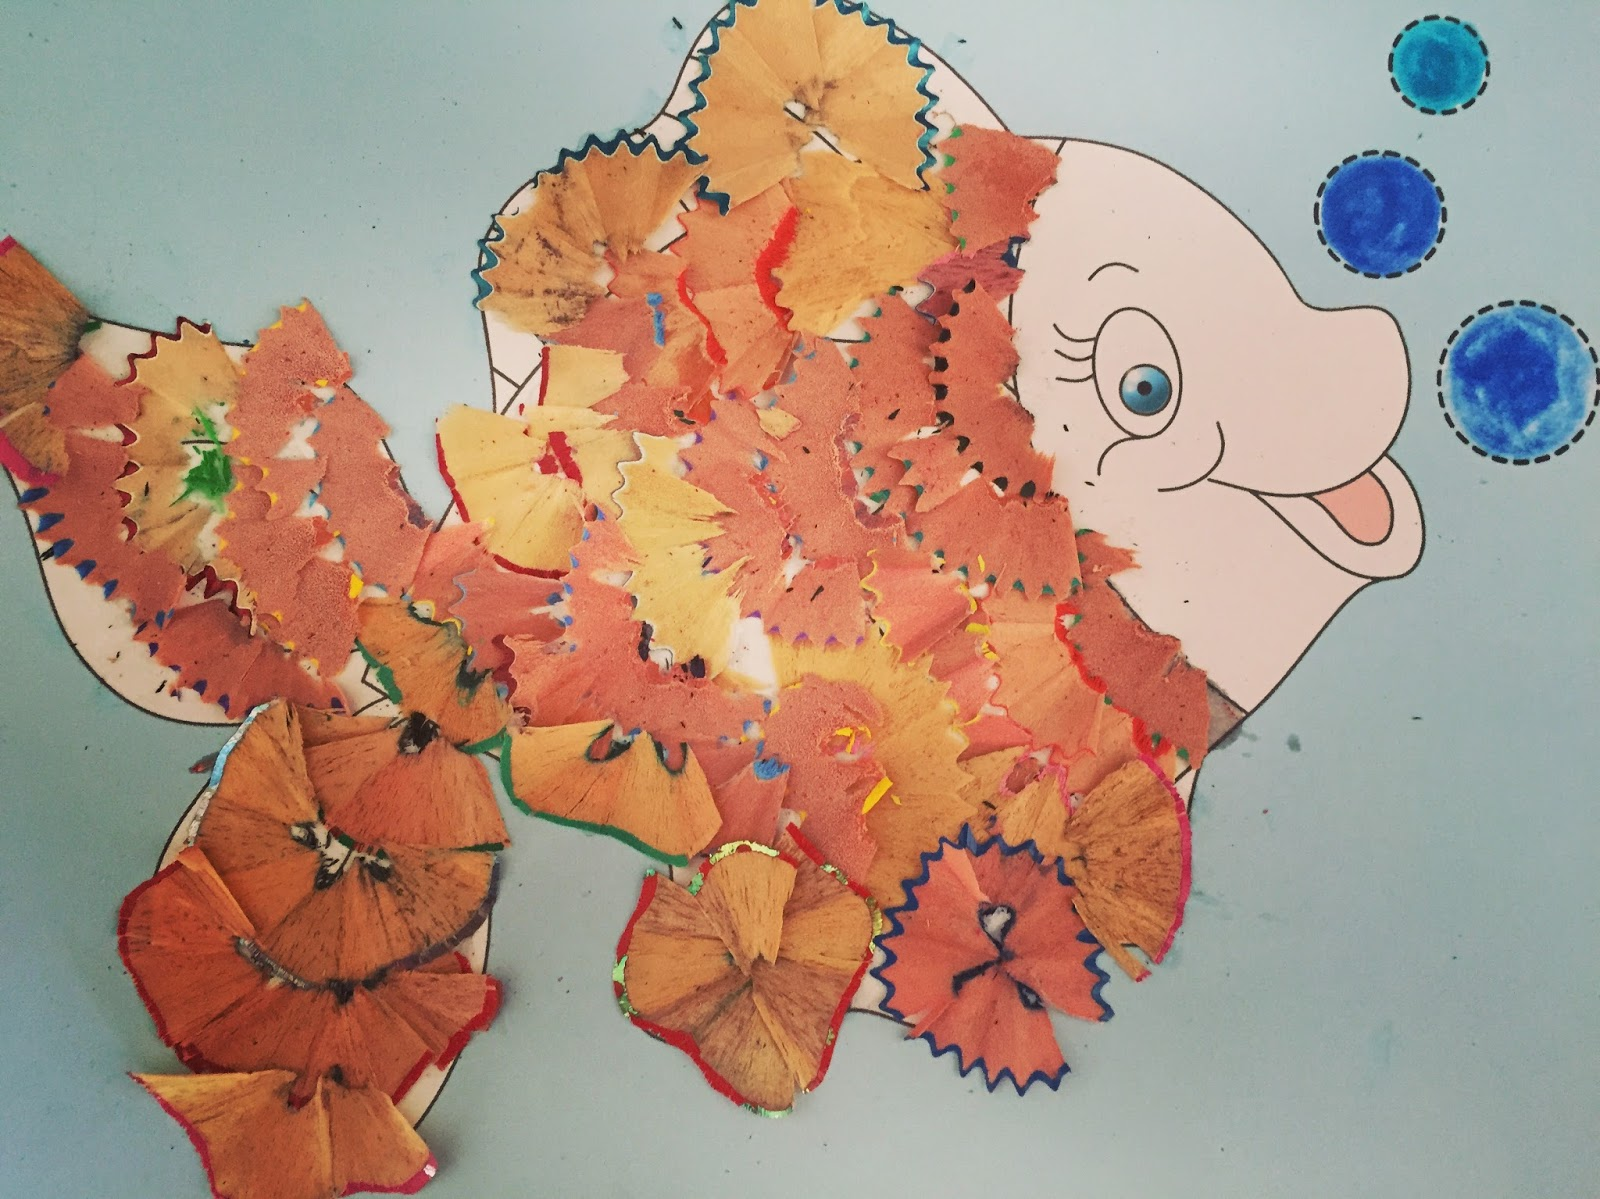 Balcanin duygu y kl sayfalari kalem p nden bali imiz for File decoration with waste material